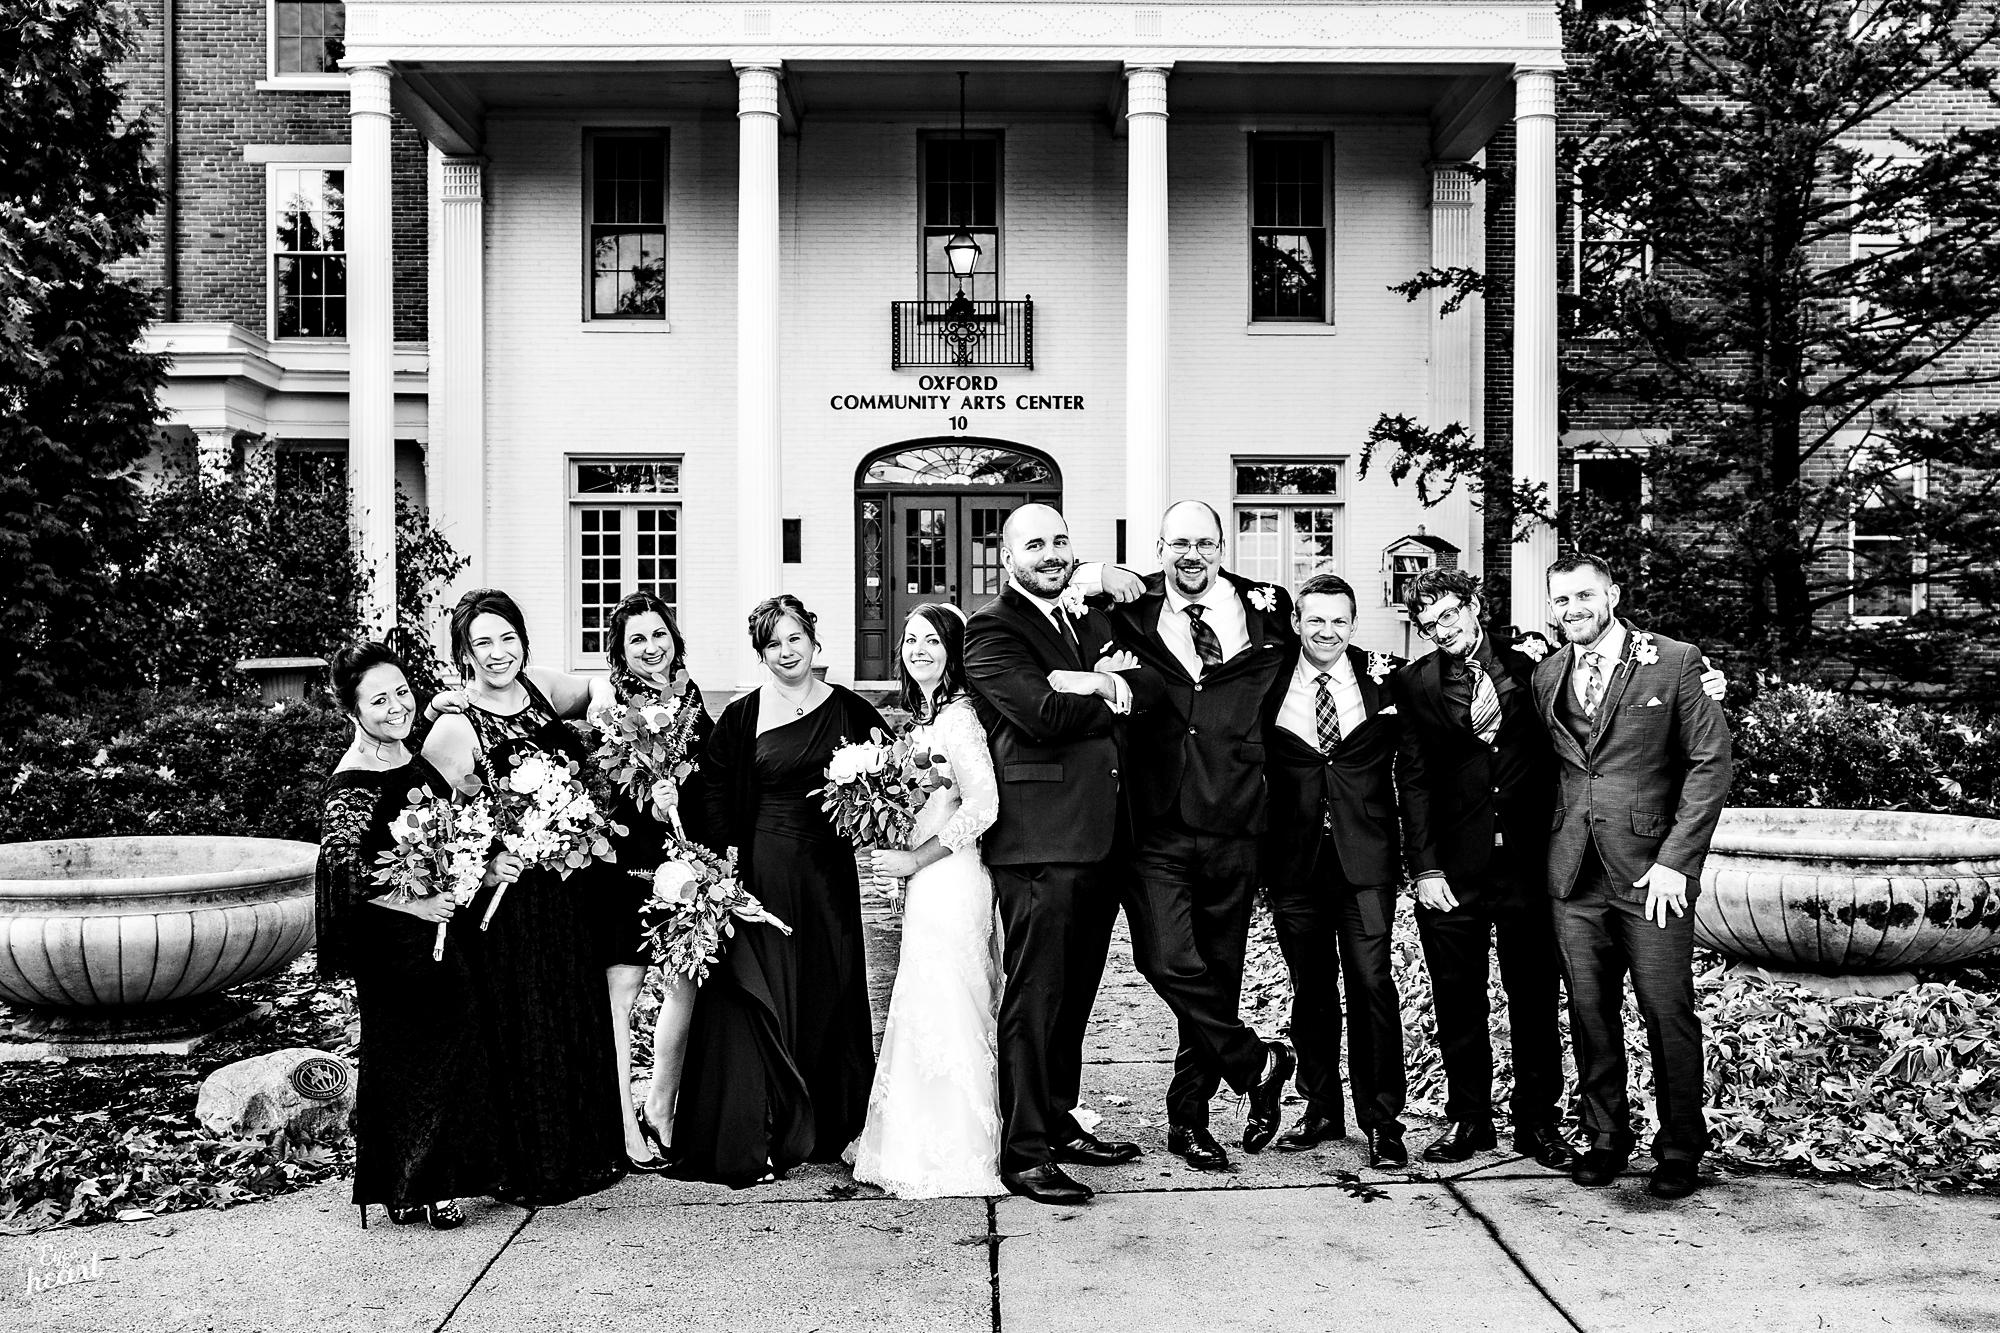 Oxford-Community-Arts-Center-Wedding-Photography-10.jpg